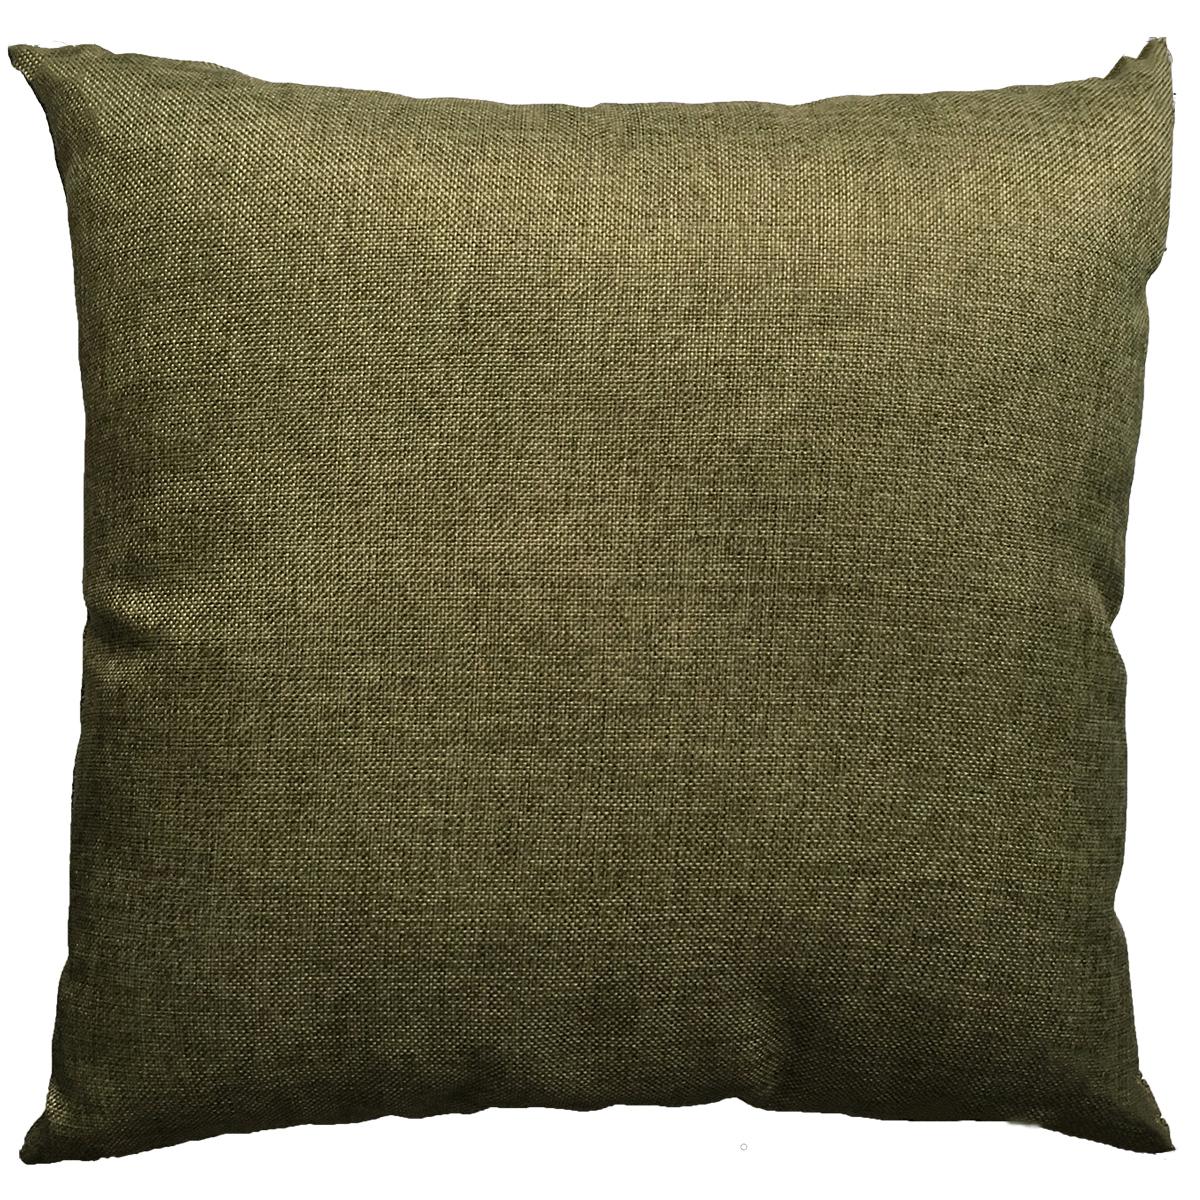 Възглавница PALMELA цвят 708 45х45 бронз